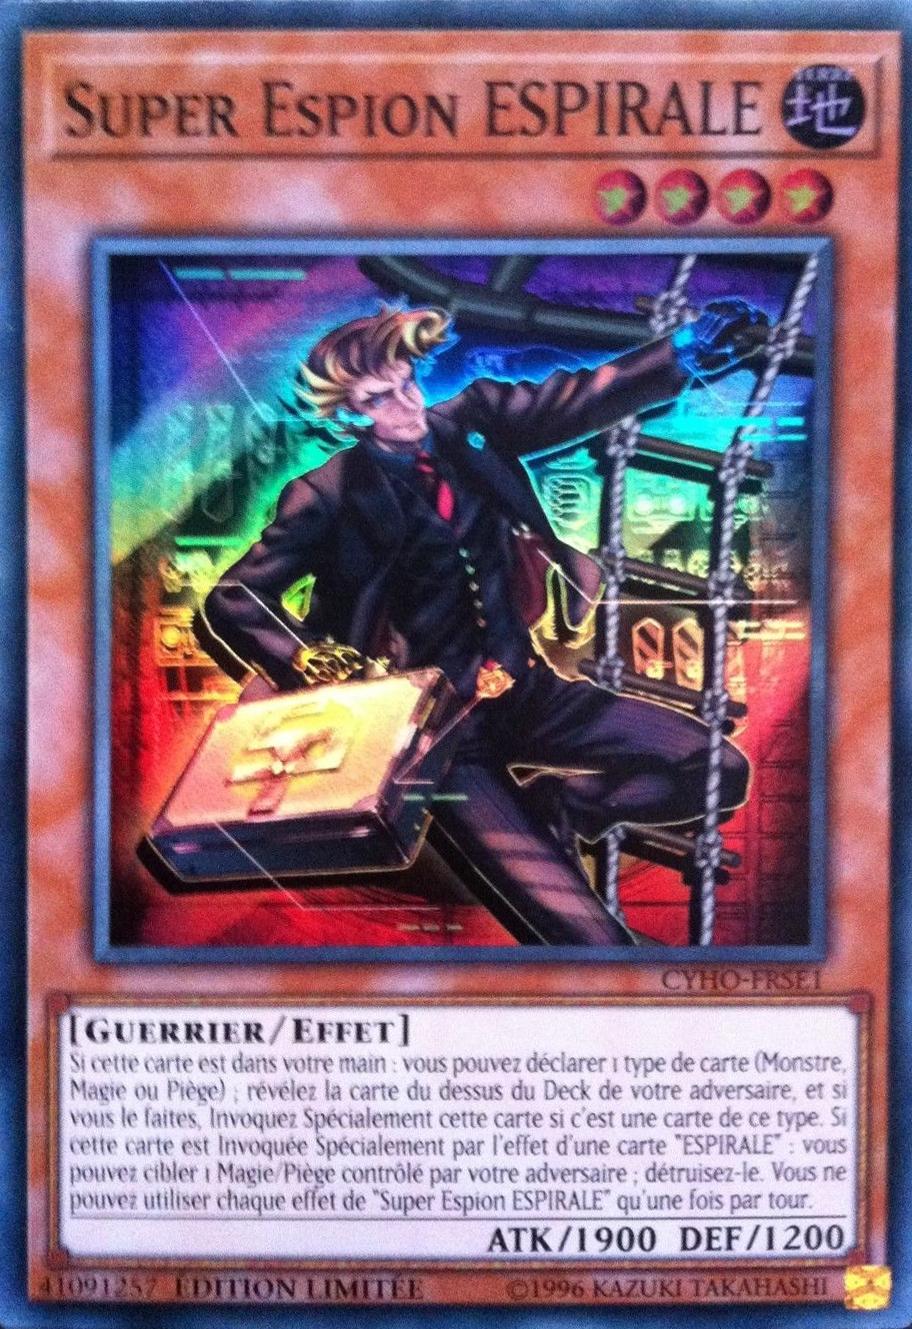 Super Espion ESPIRALE